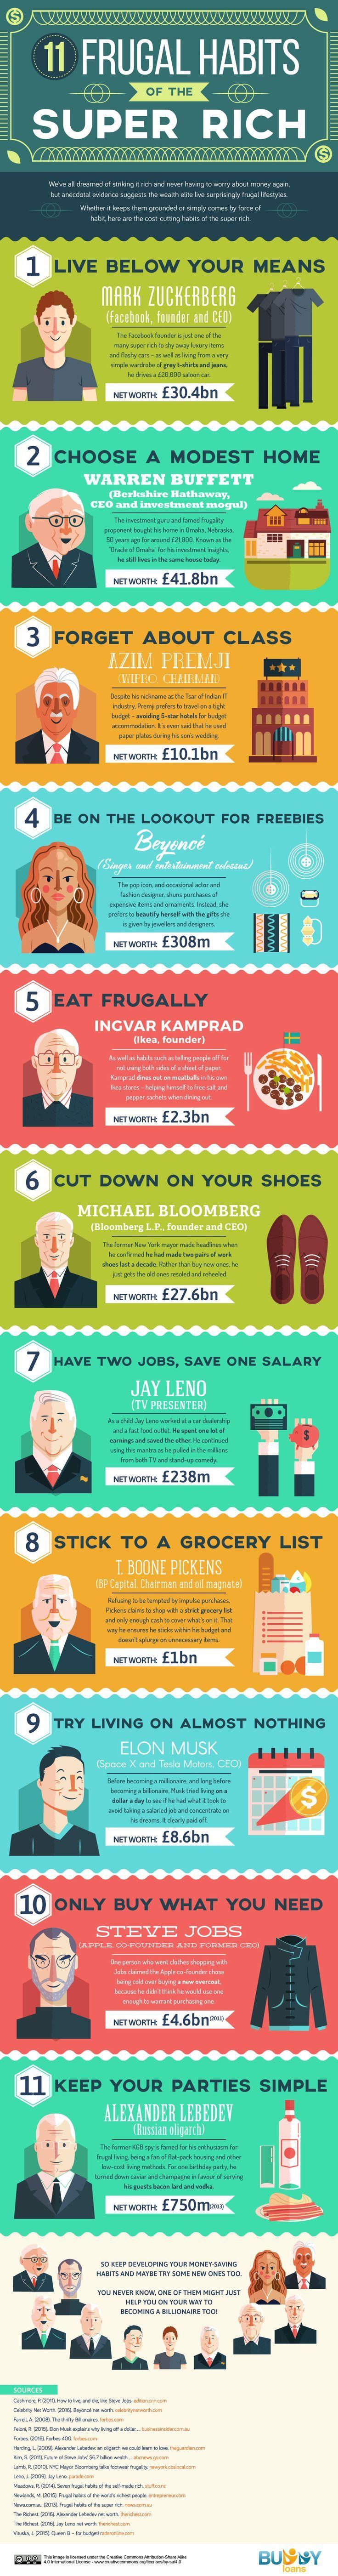 11 frugal habits of the super rich #infographic #Entrepreneur #SuccessStories